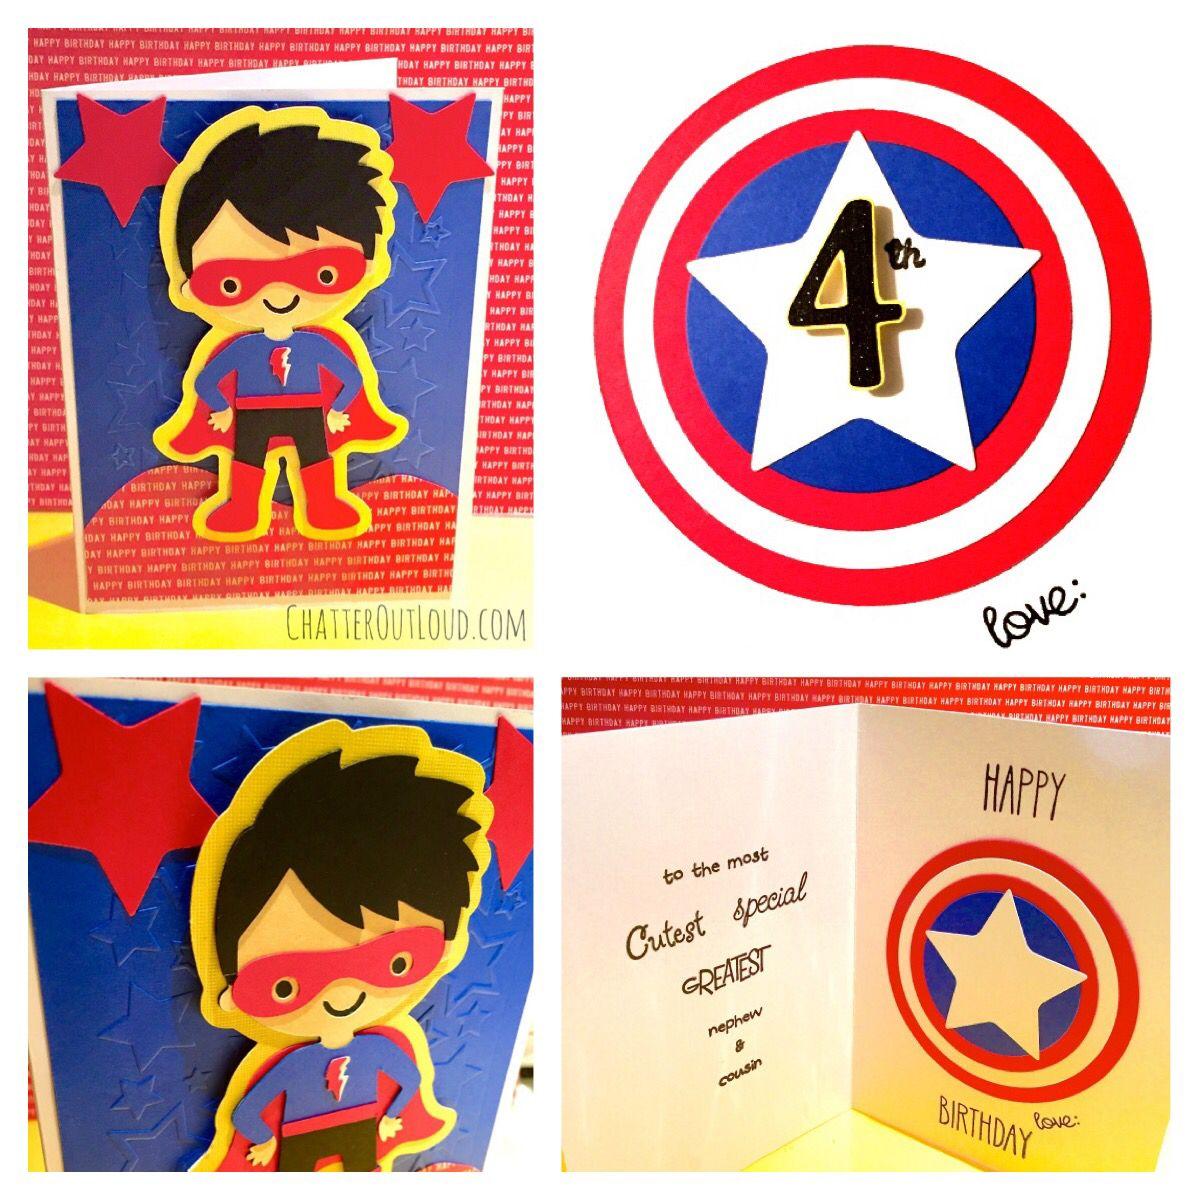 Superhero birthday card star embossing folder cricut create a superhero birthday card star embossing folder cricut create a friend happy birthday kristyandbryce Image collections